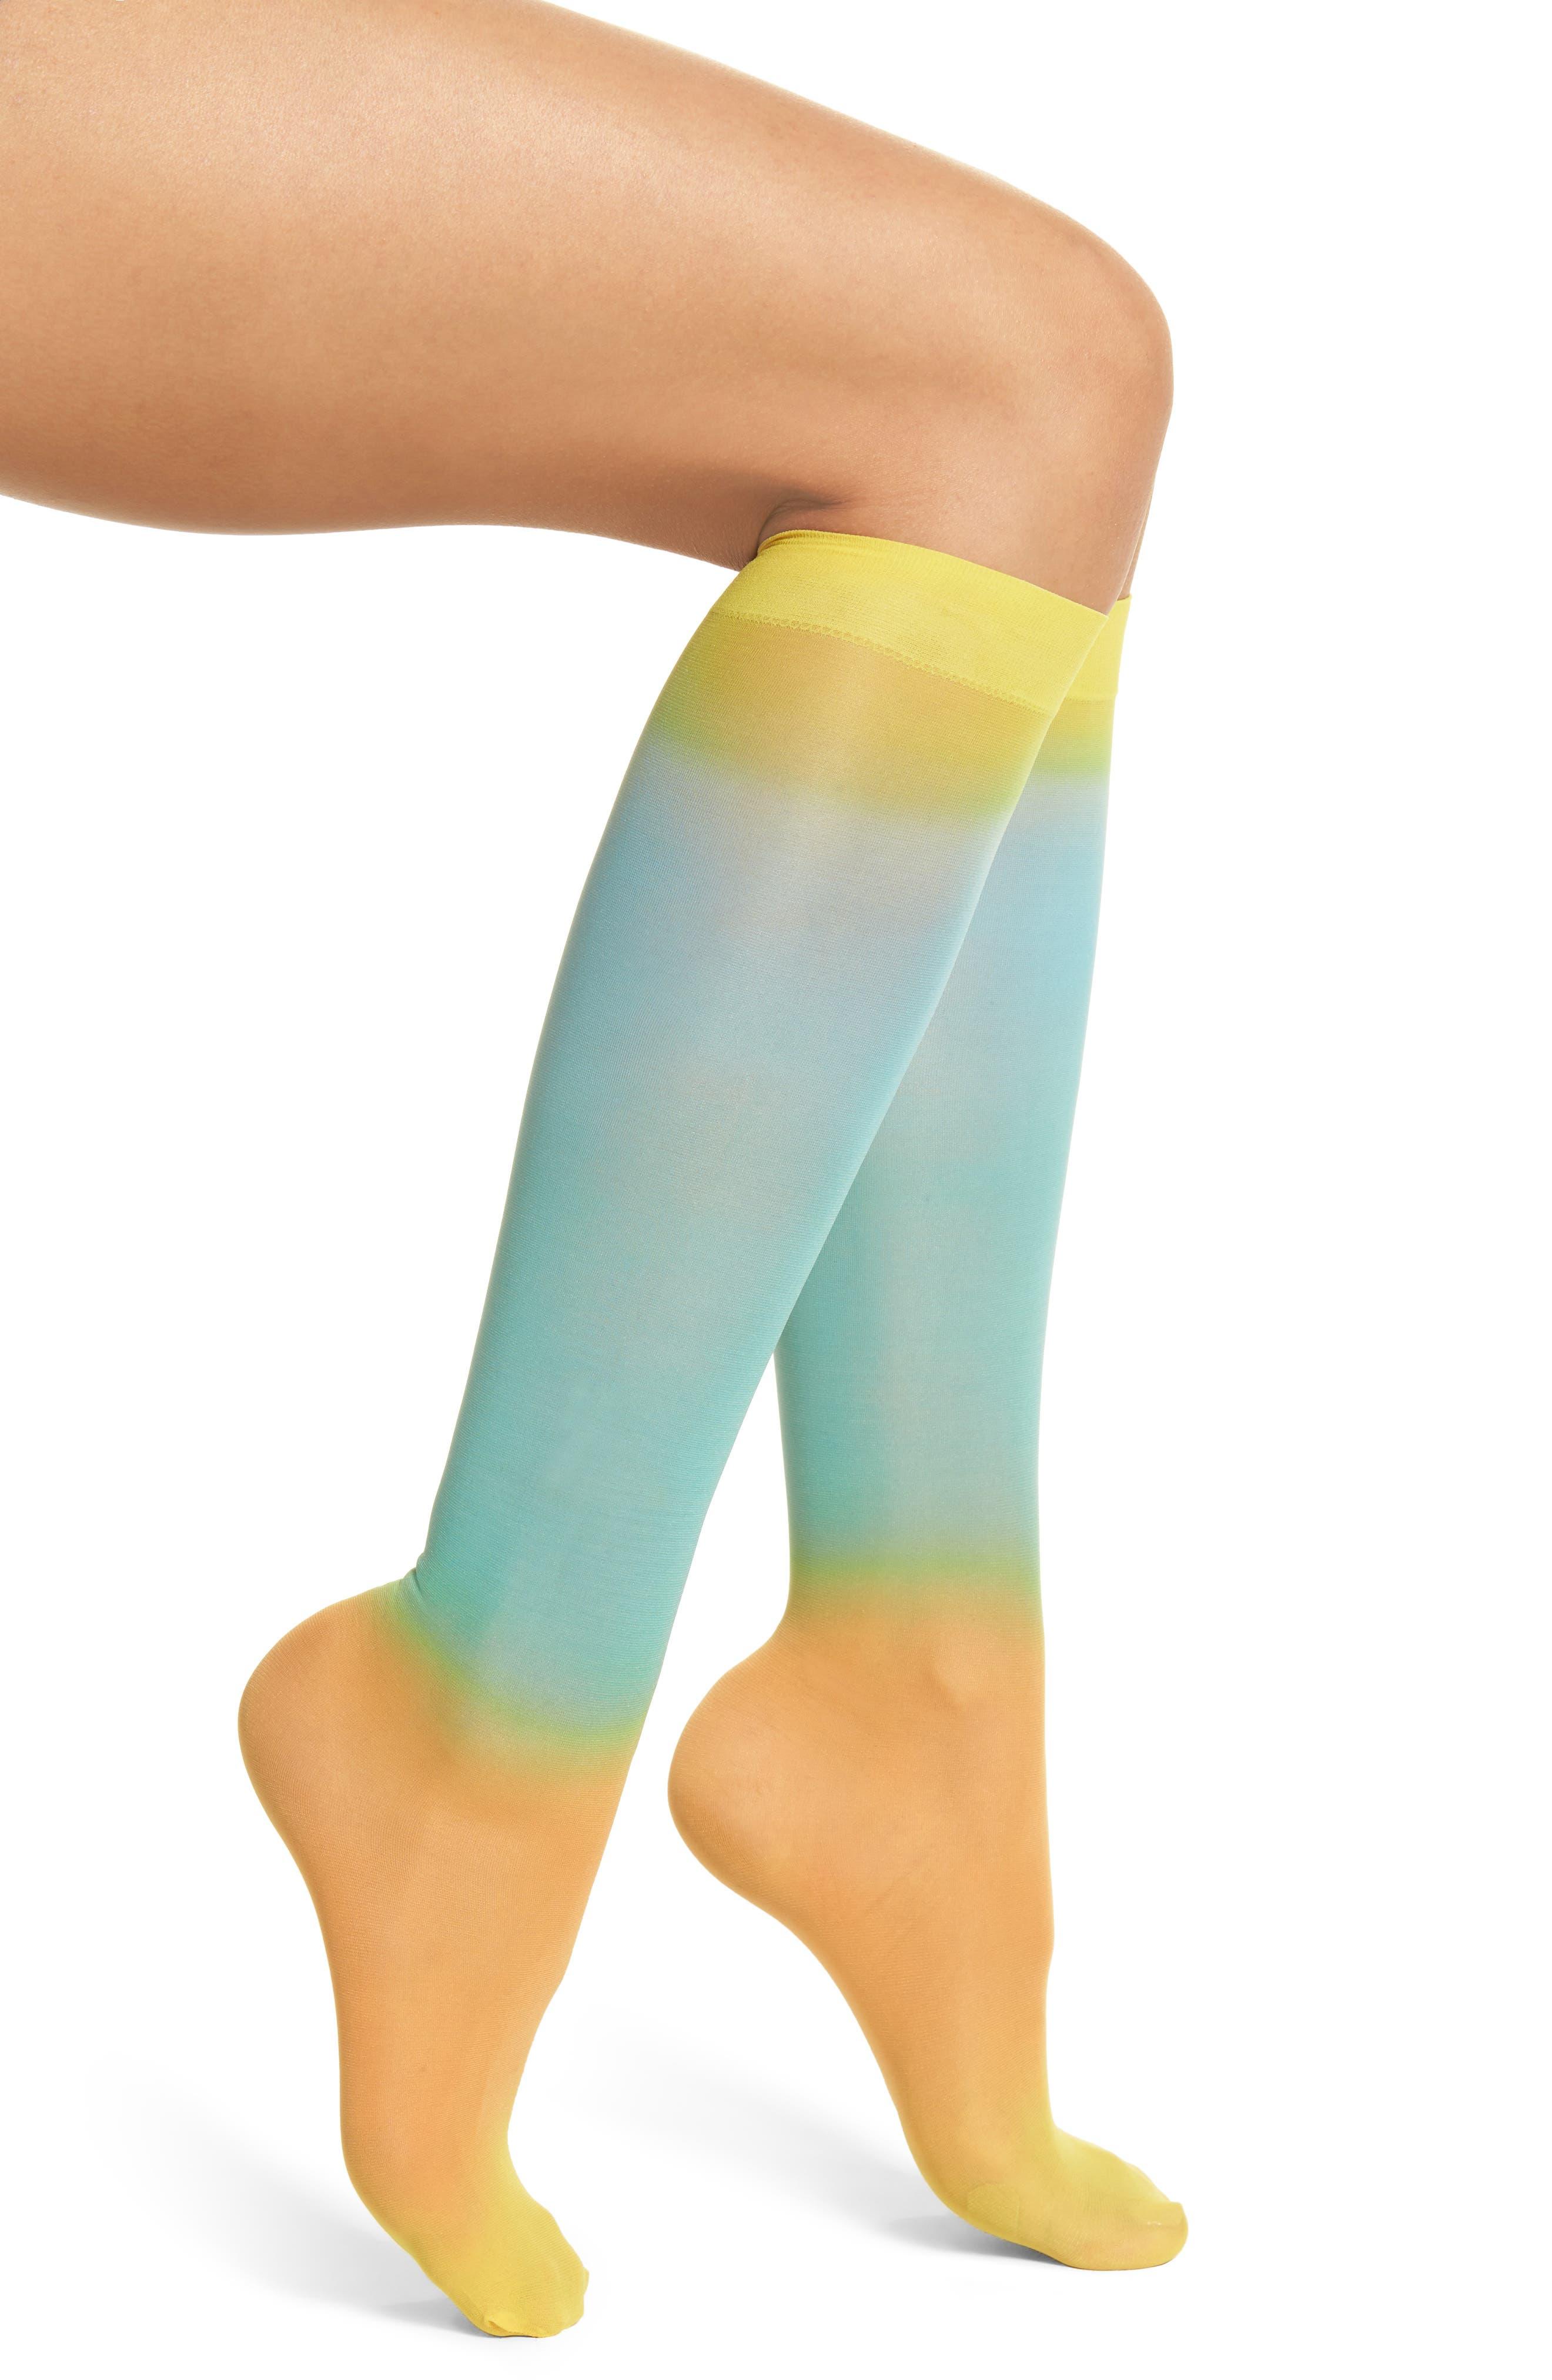 HYSTERIA BY HAPPY SOCKS,                             Mia Print Knee High Socks,                             Main thumbnail 1, color,                             449